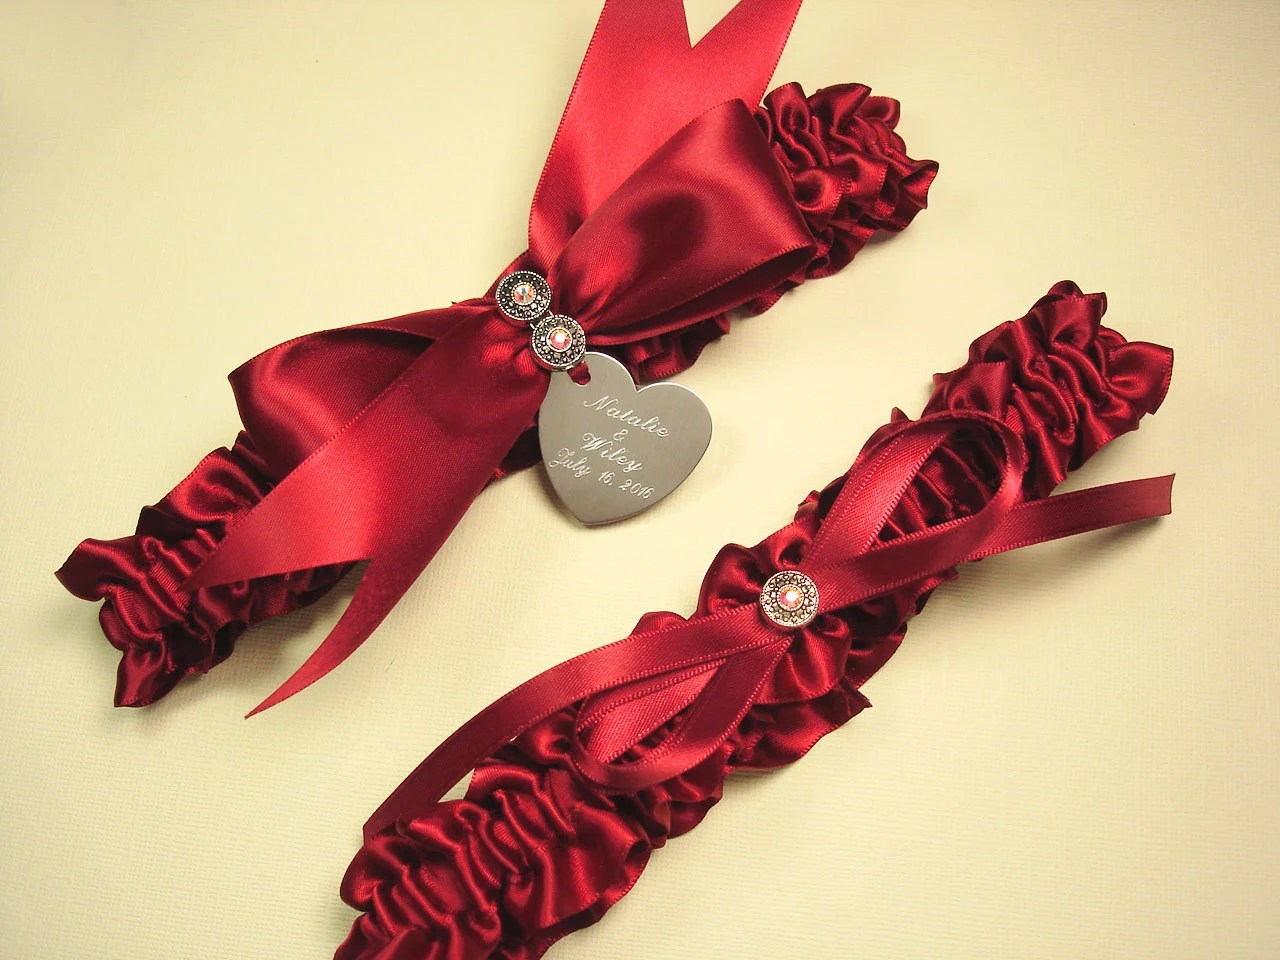 Personalized Red Wedding Garter Set With Swarovski Crystals